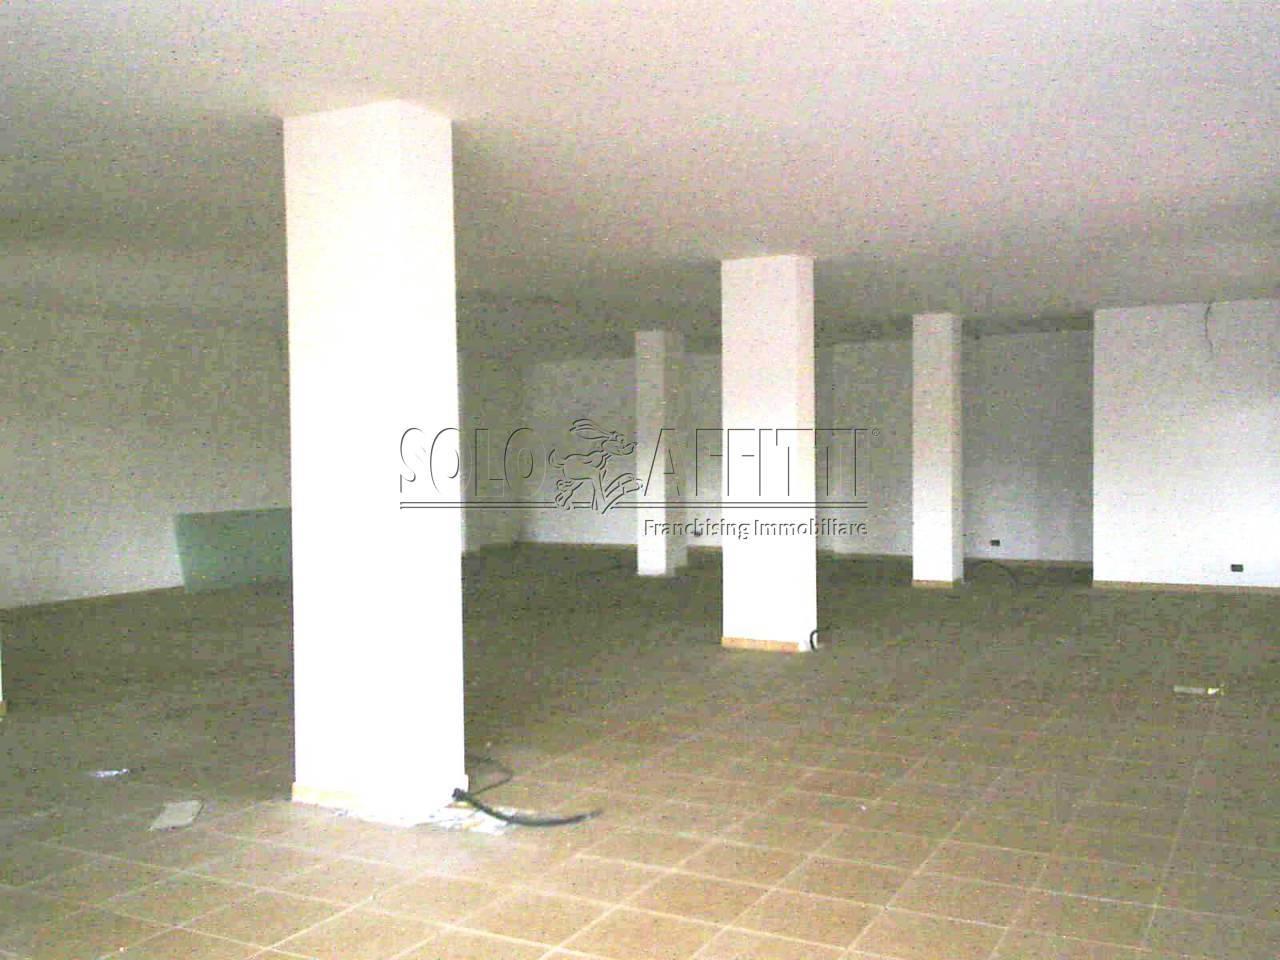 Fondo/negozio - 4 vetrine/luci a Via Napoli - Via Amendola, Sassari